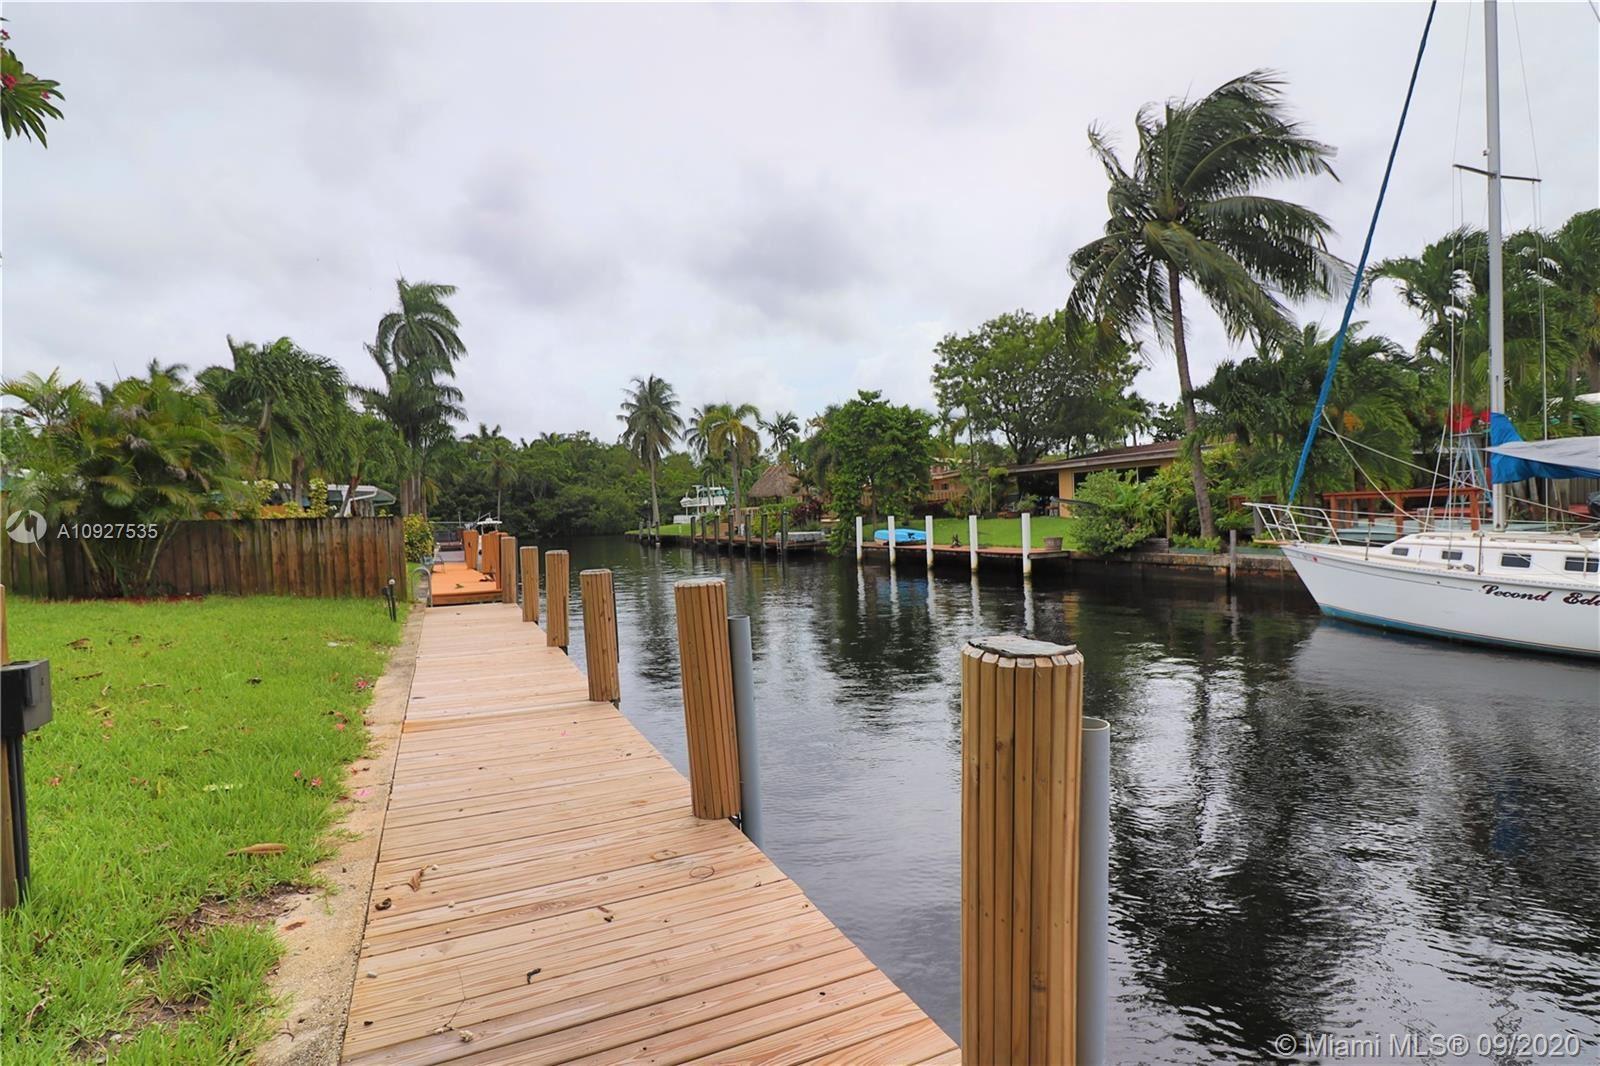 2511 Bimini Ln, Fort Lauderdale, FL 33312 - #: A10927535